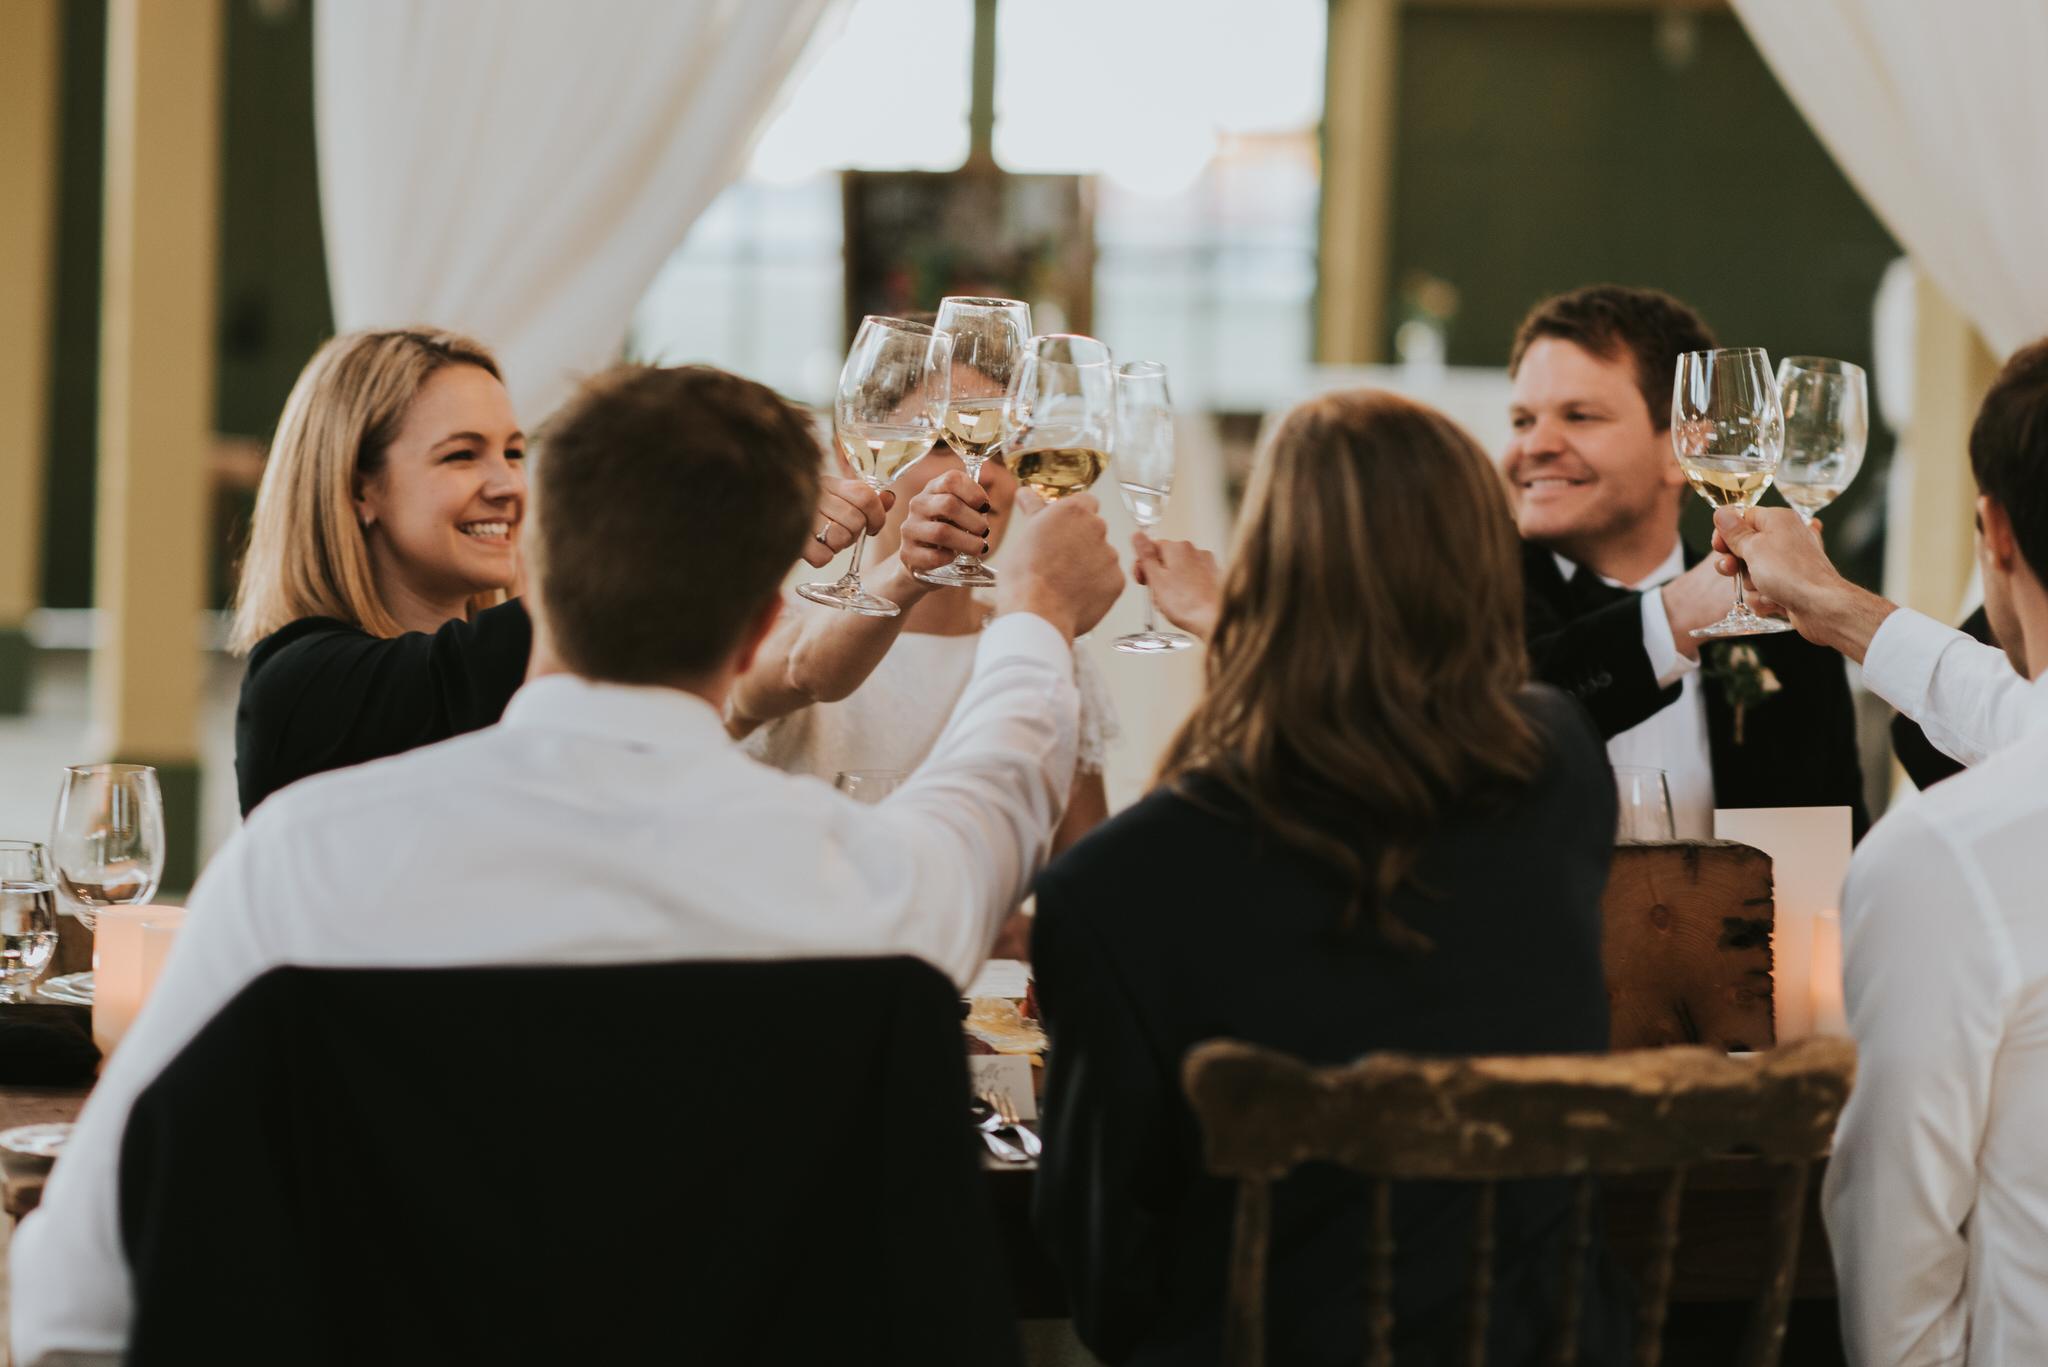 scarletoneillphotography_weddingphotography_prince edward county weddings150.JPG